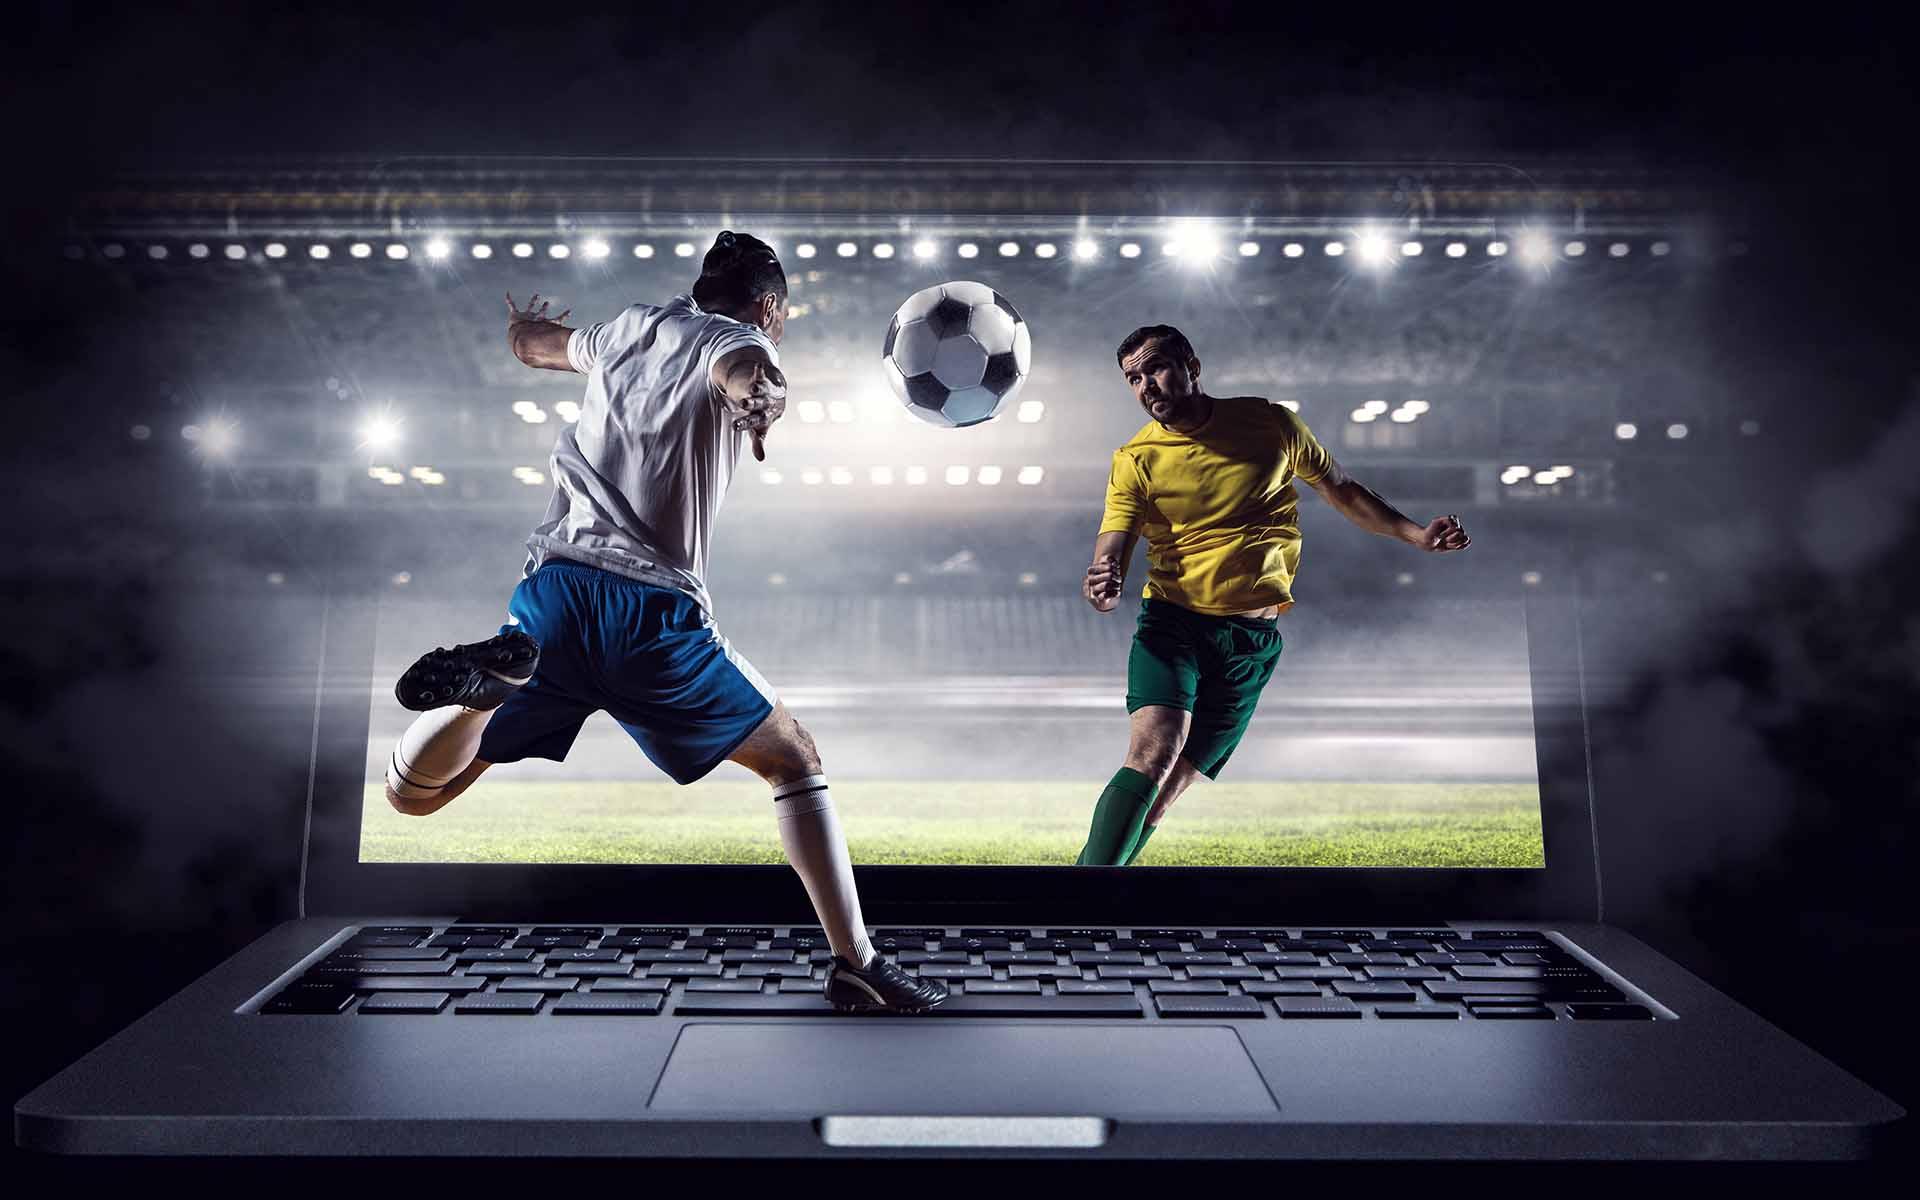 Ставки на спорт в биткоинах, спортивные ставки, Cloudbet, Bitcoin, BTC